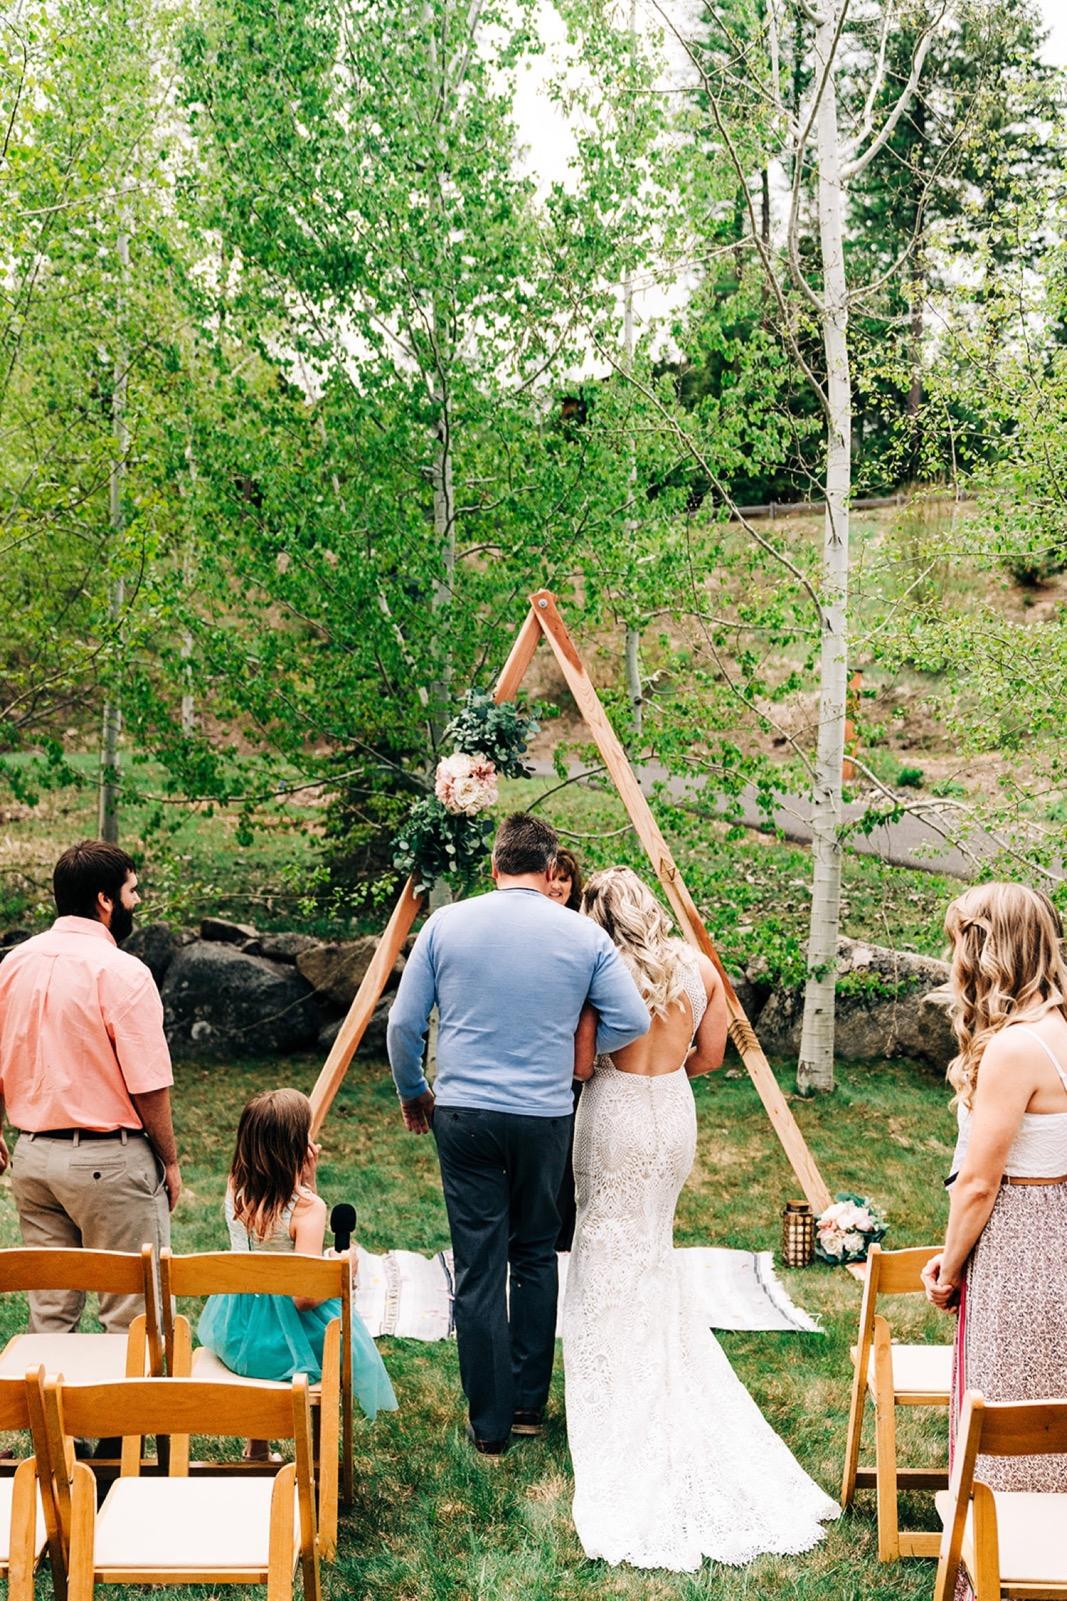 055_falissa_heather_wedding-138.jpg